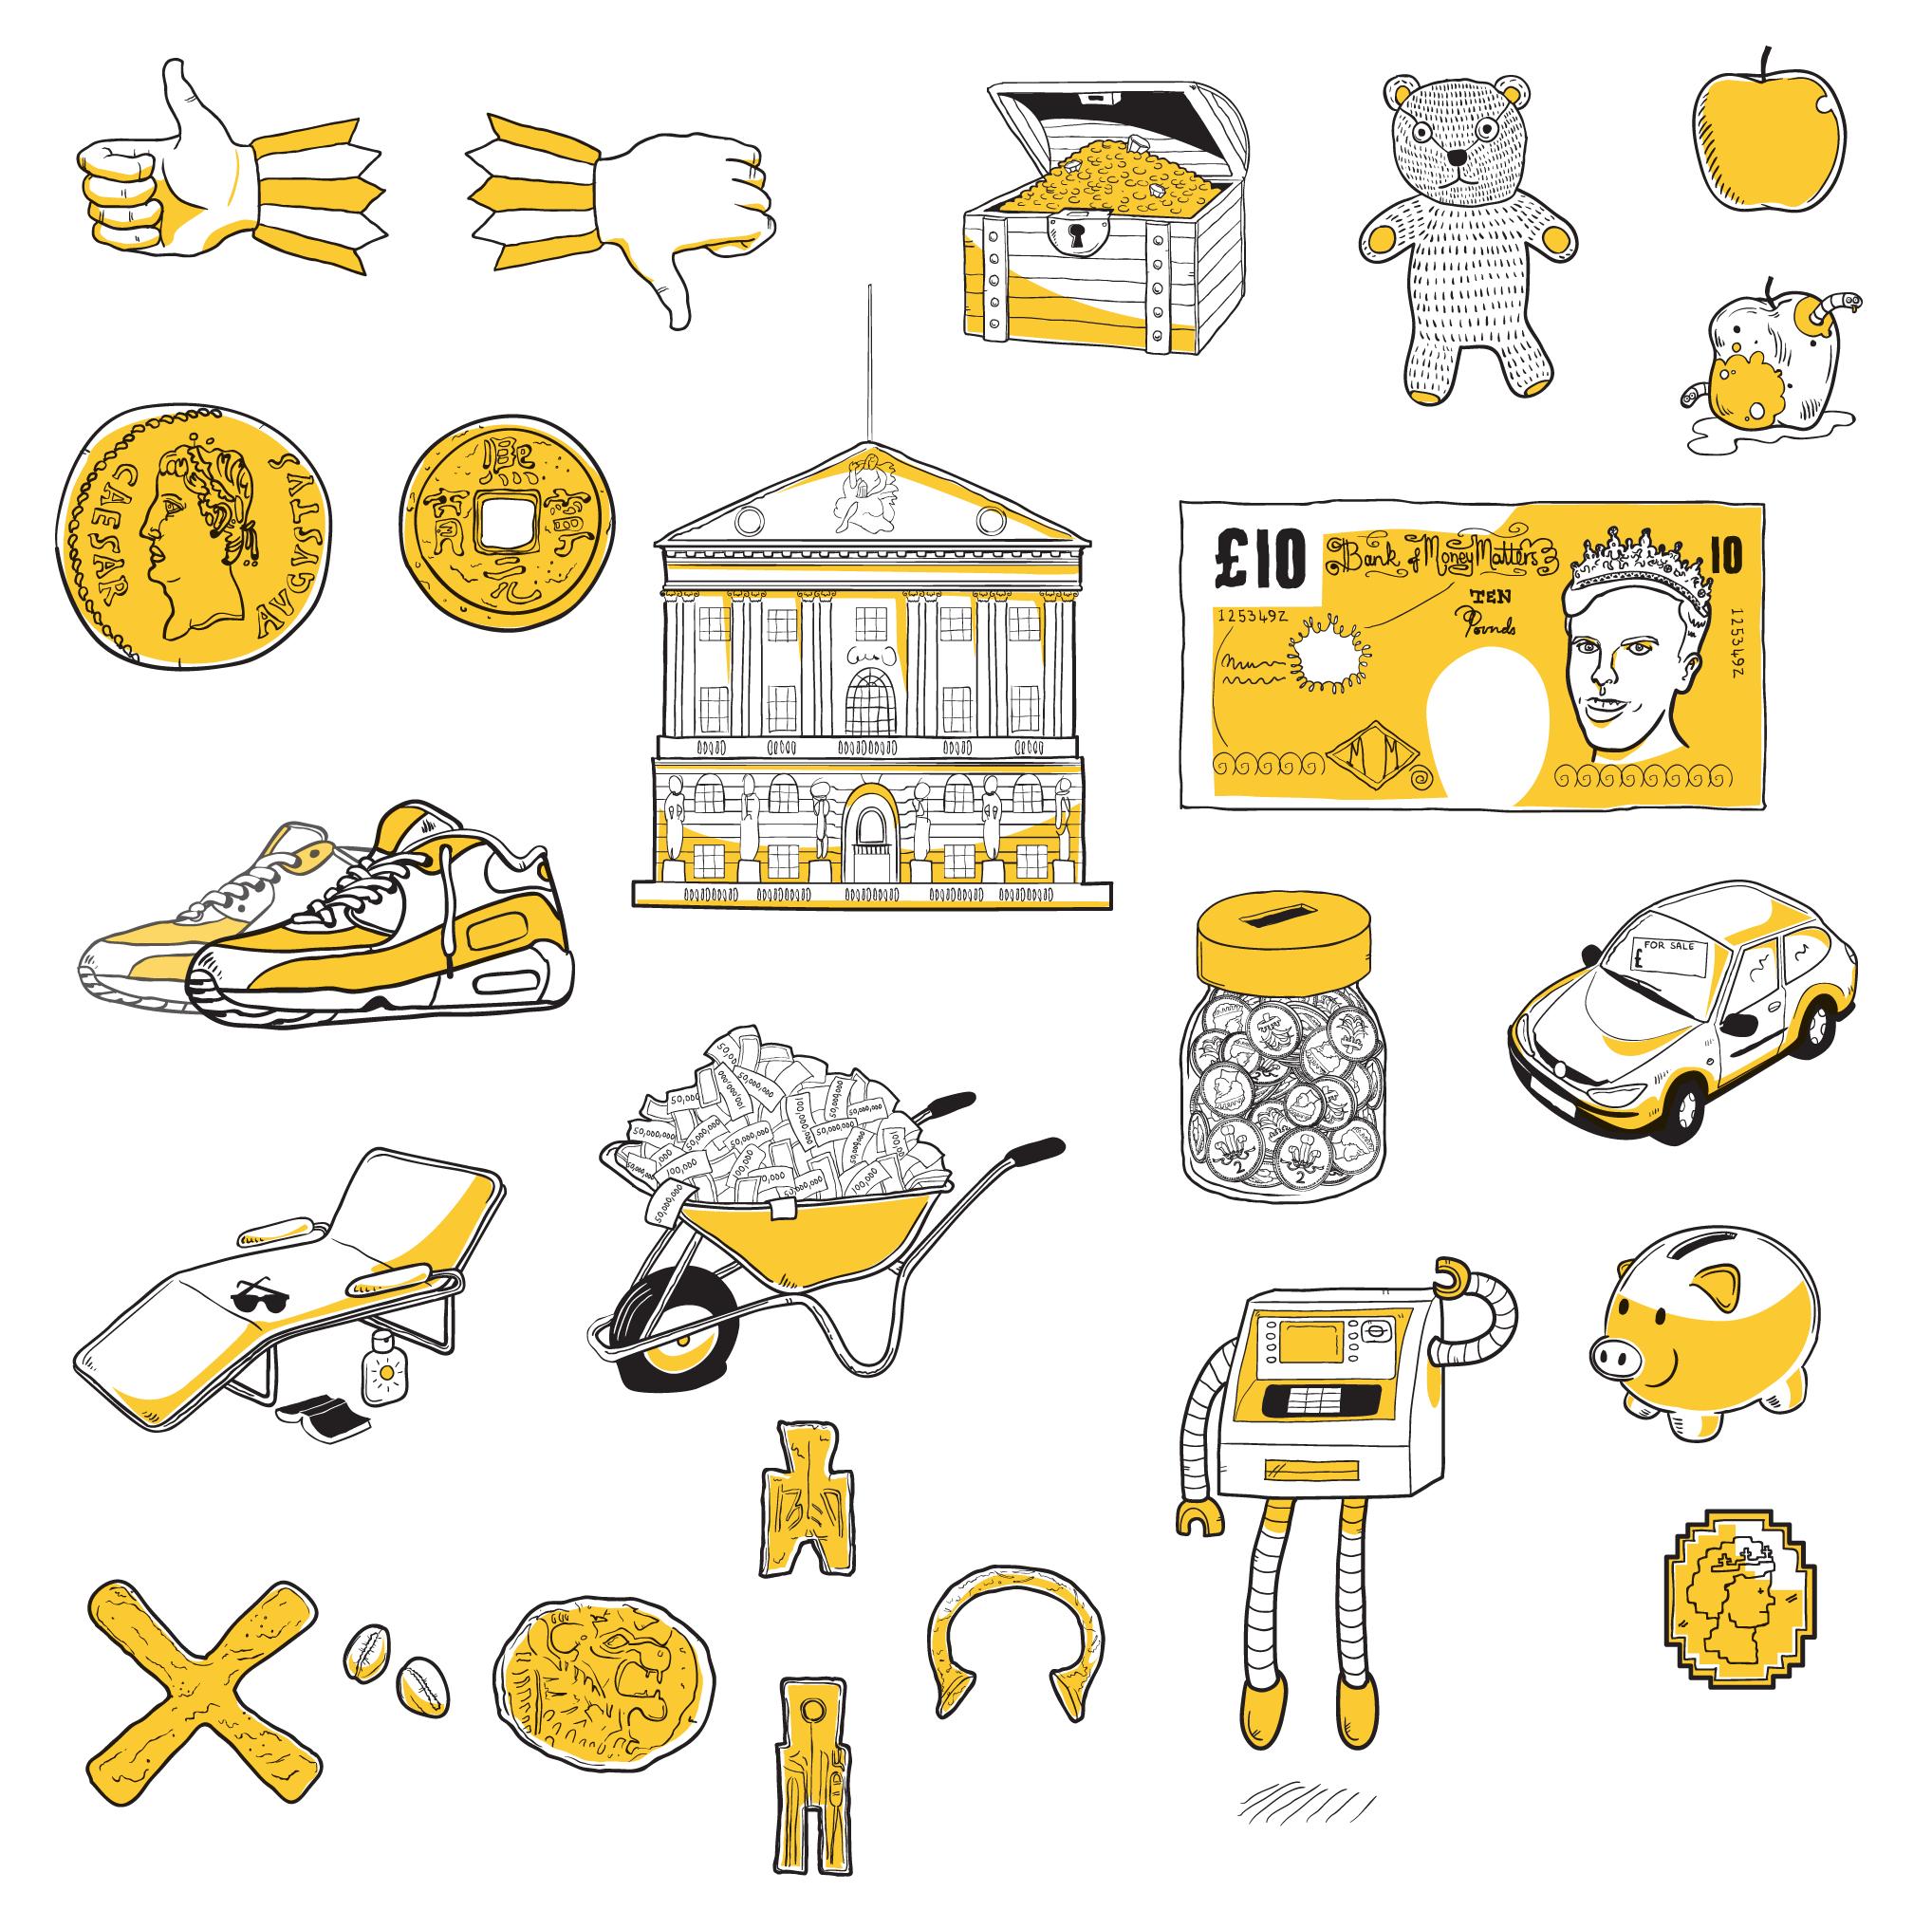 kash bm illustrations